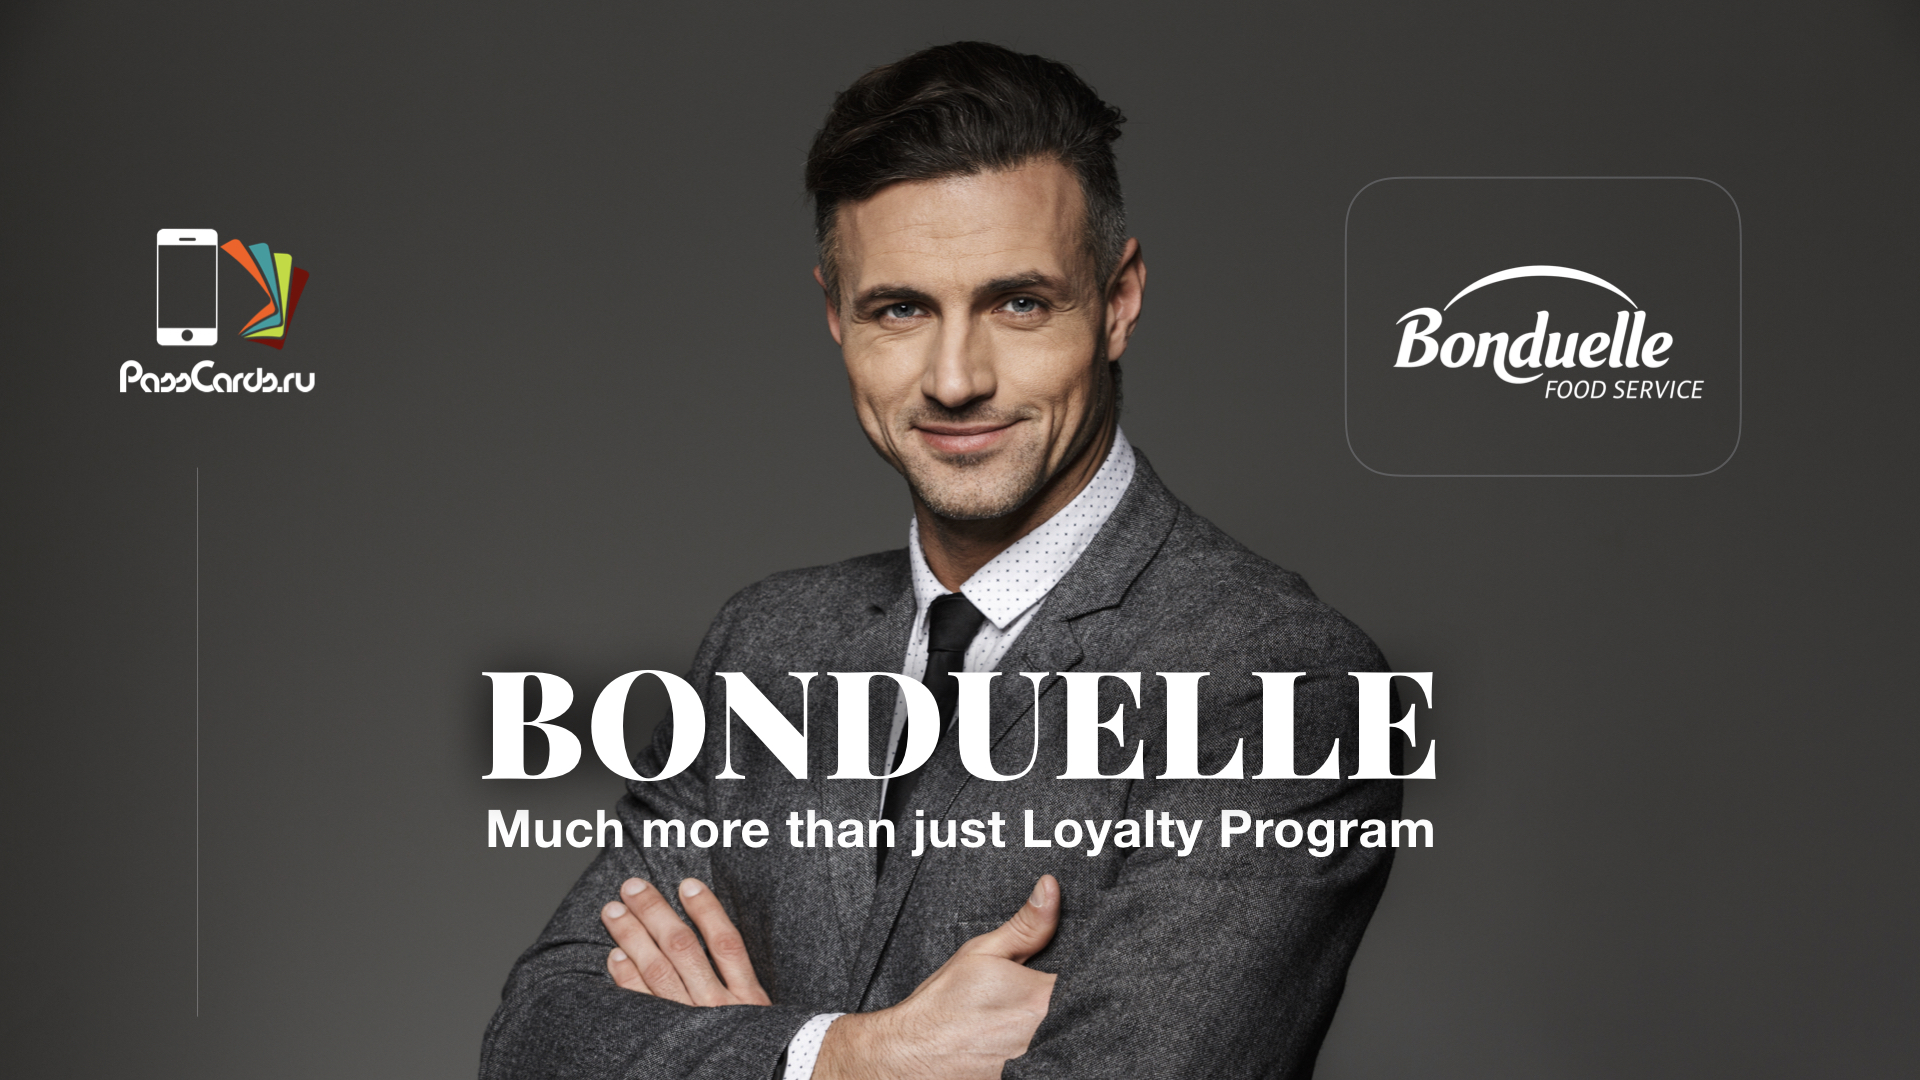 Bonduelle Loyalty Programm (2019)